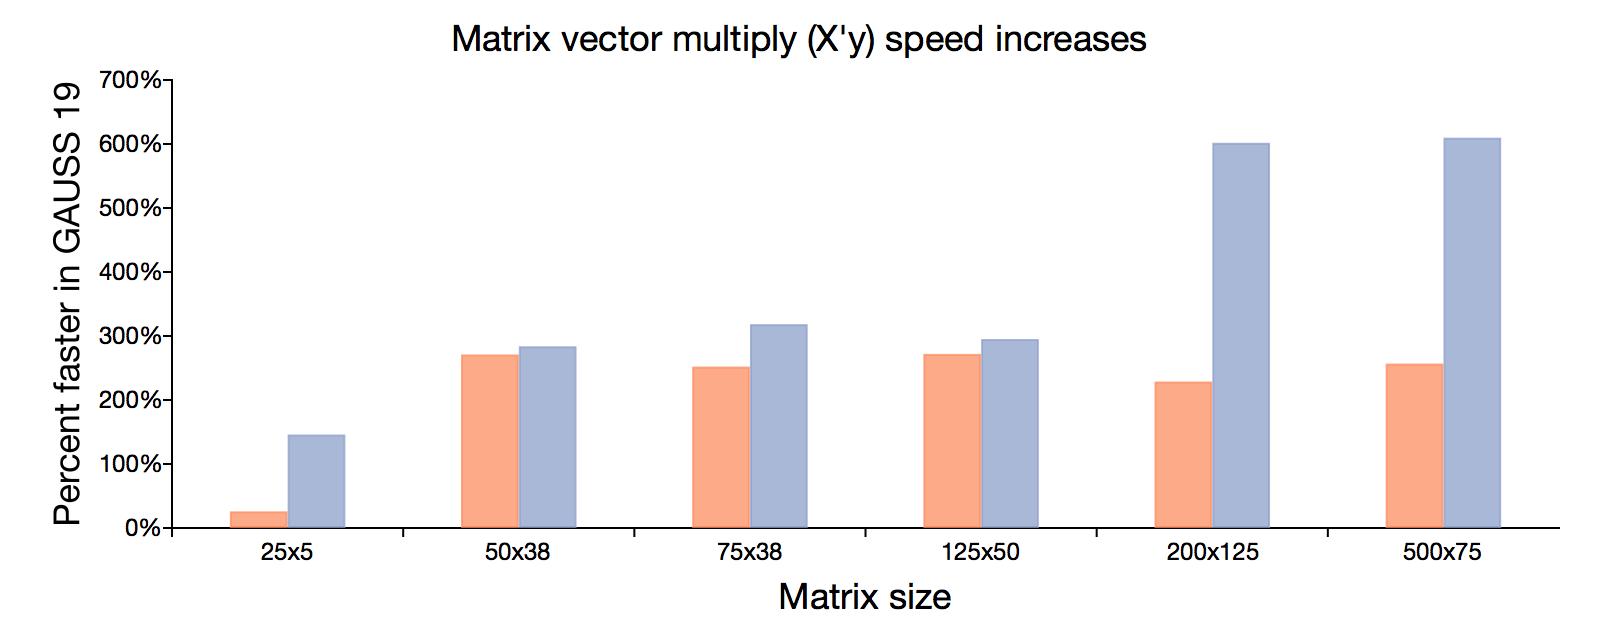 Matrix vector multiply speed-ups in GAUSS 19.